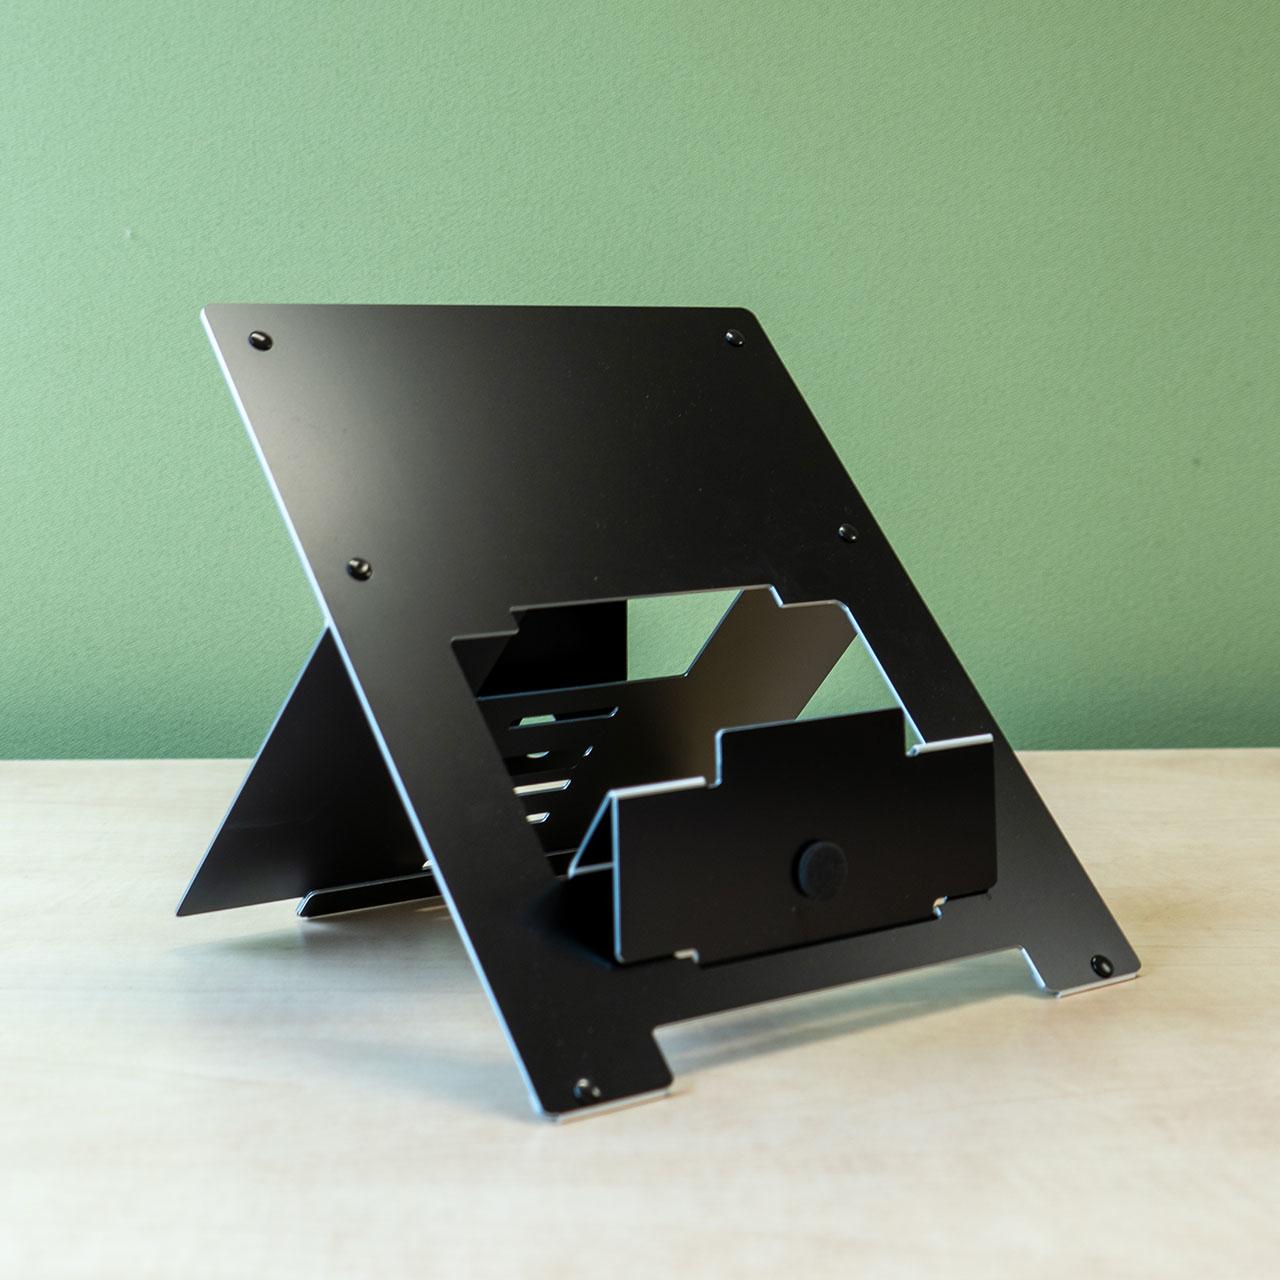 Afbeeldingen van R-Go Riser laptophouder en laptopsteun